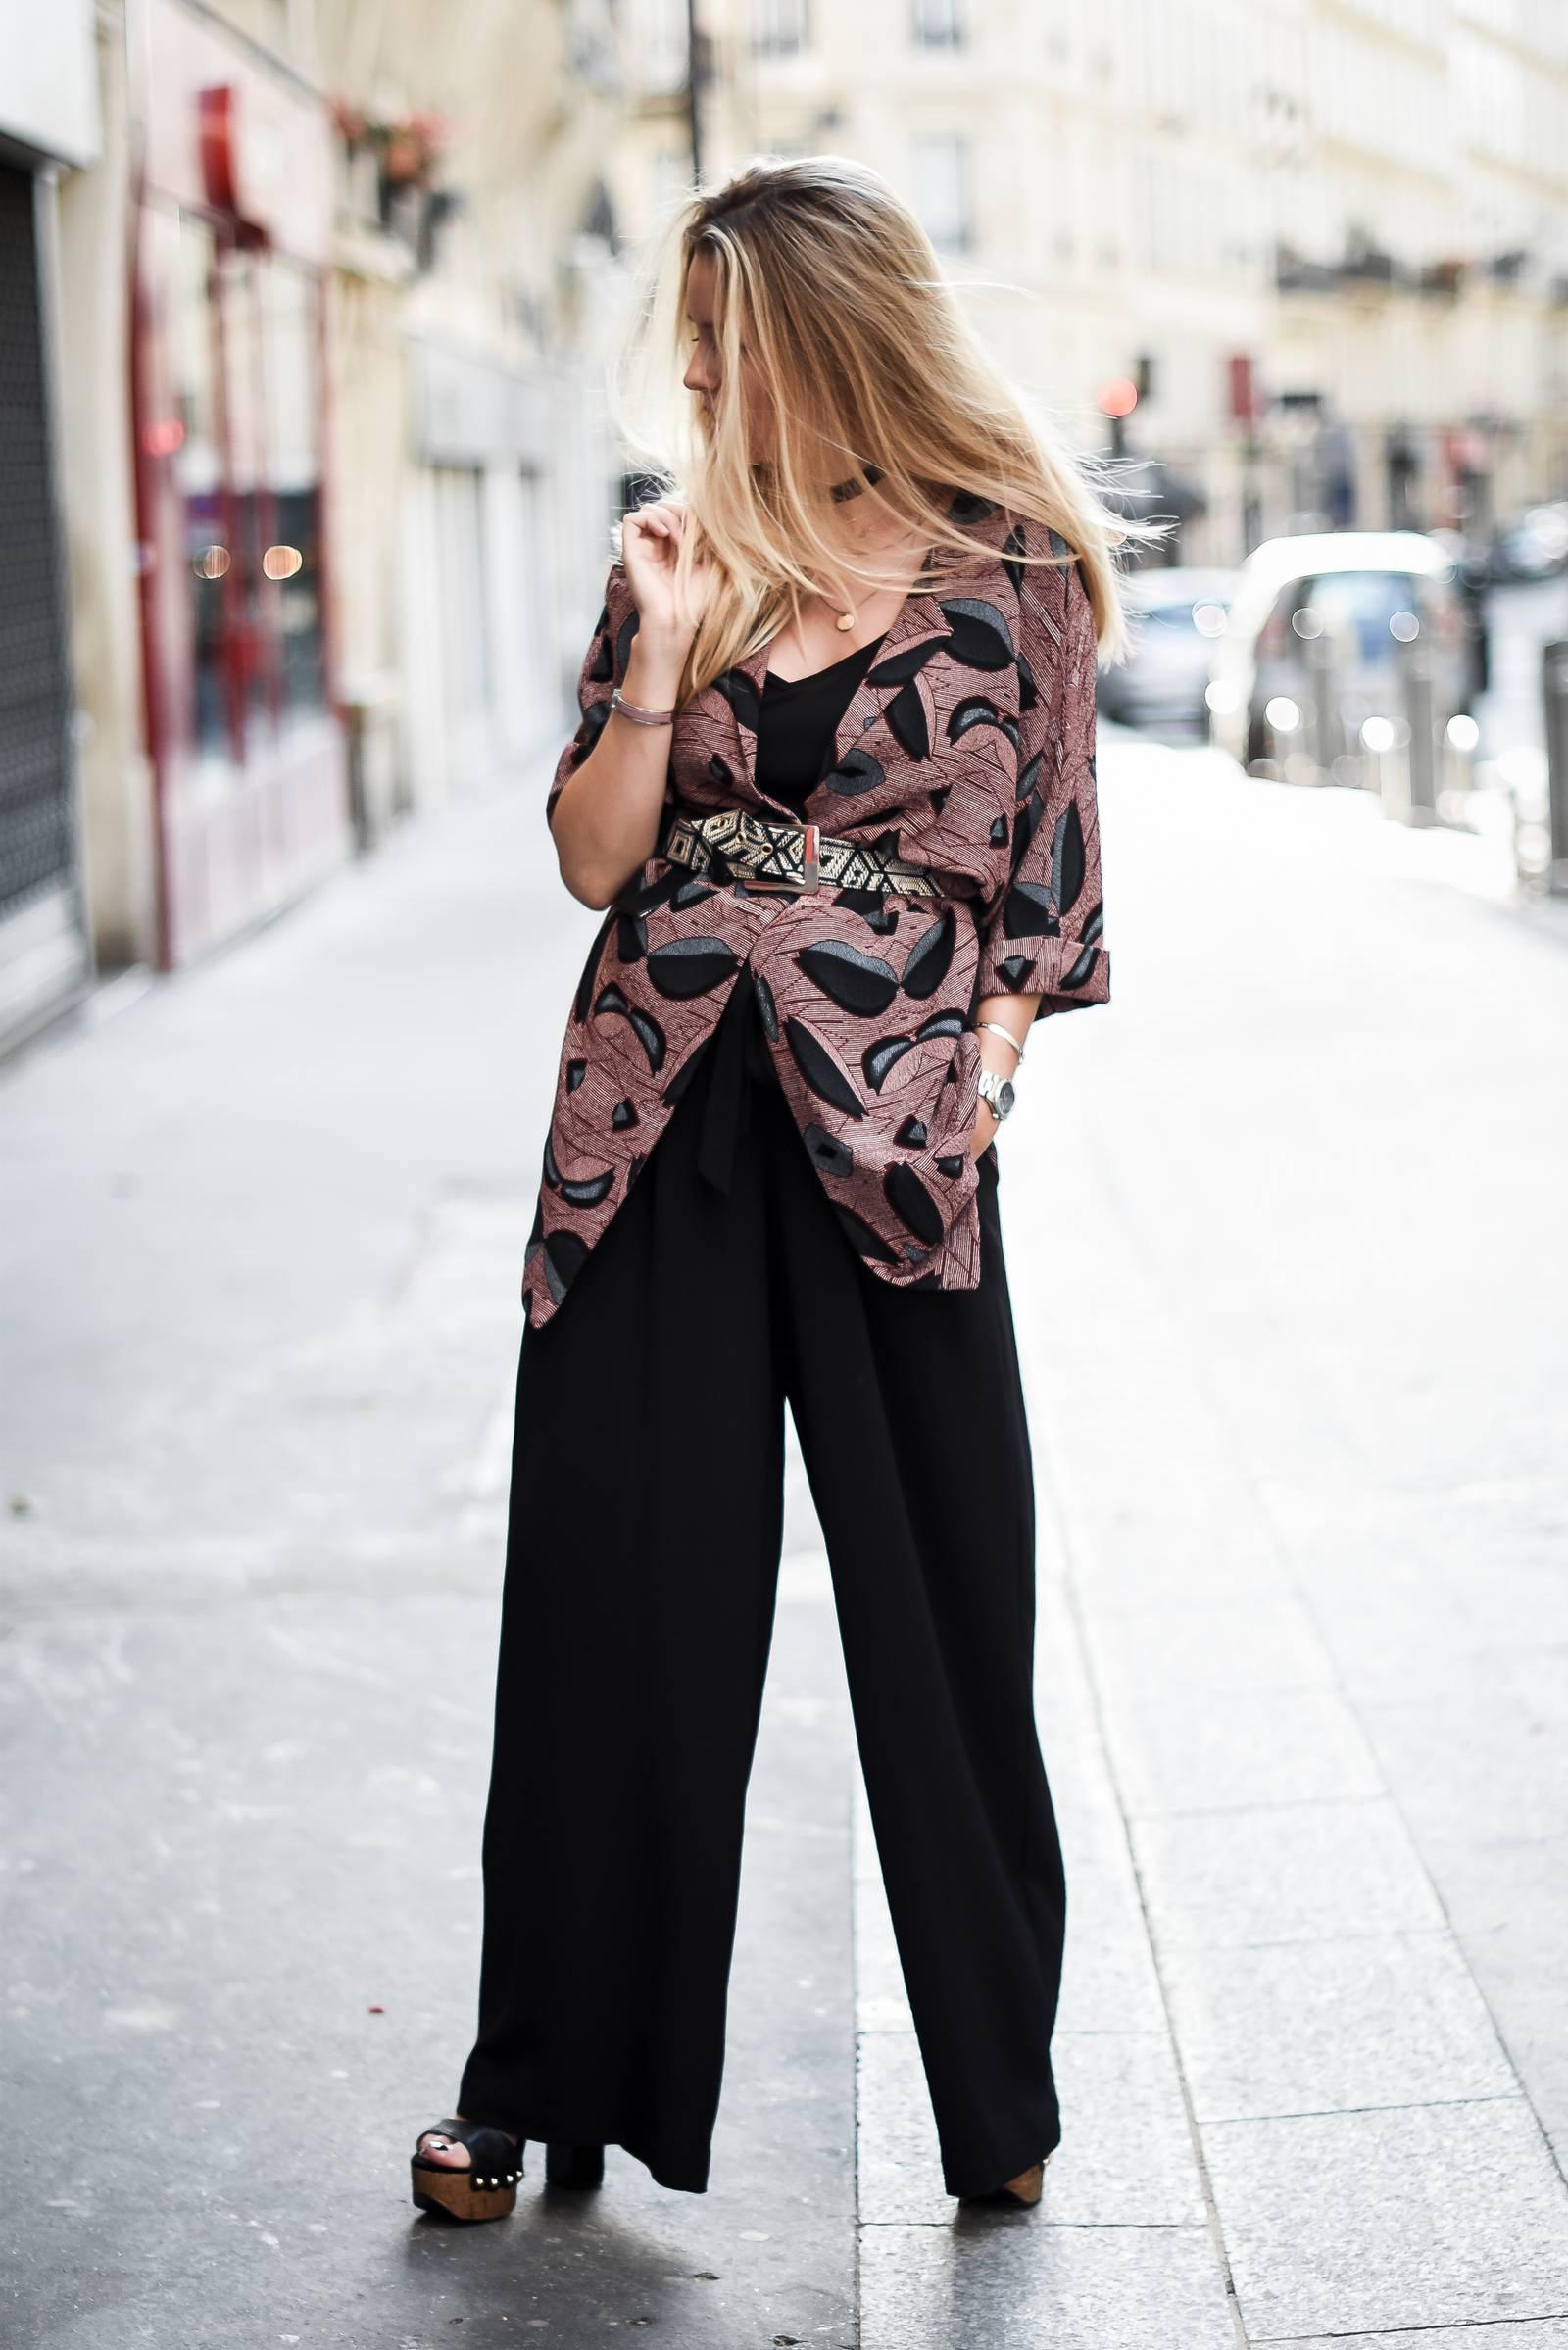 blog mode - Comment s'habiller pour aller au restaurant 16